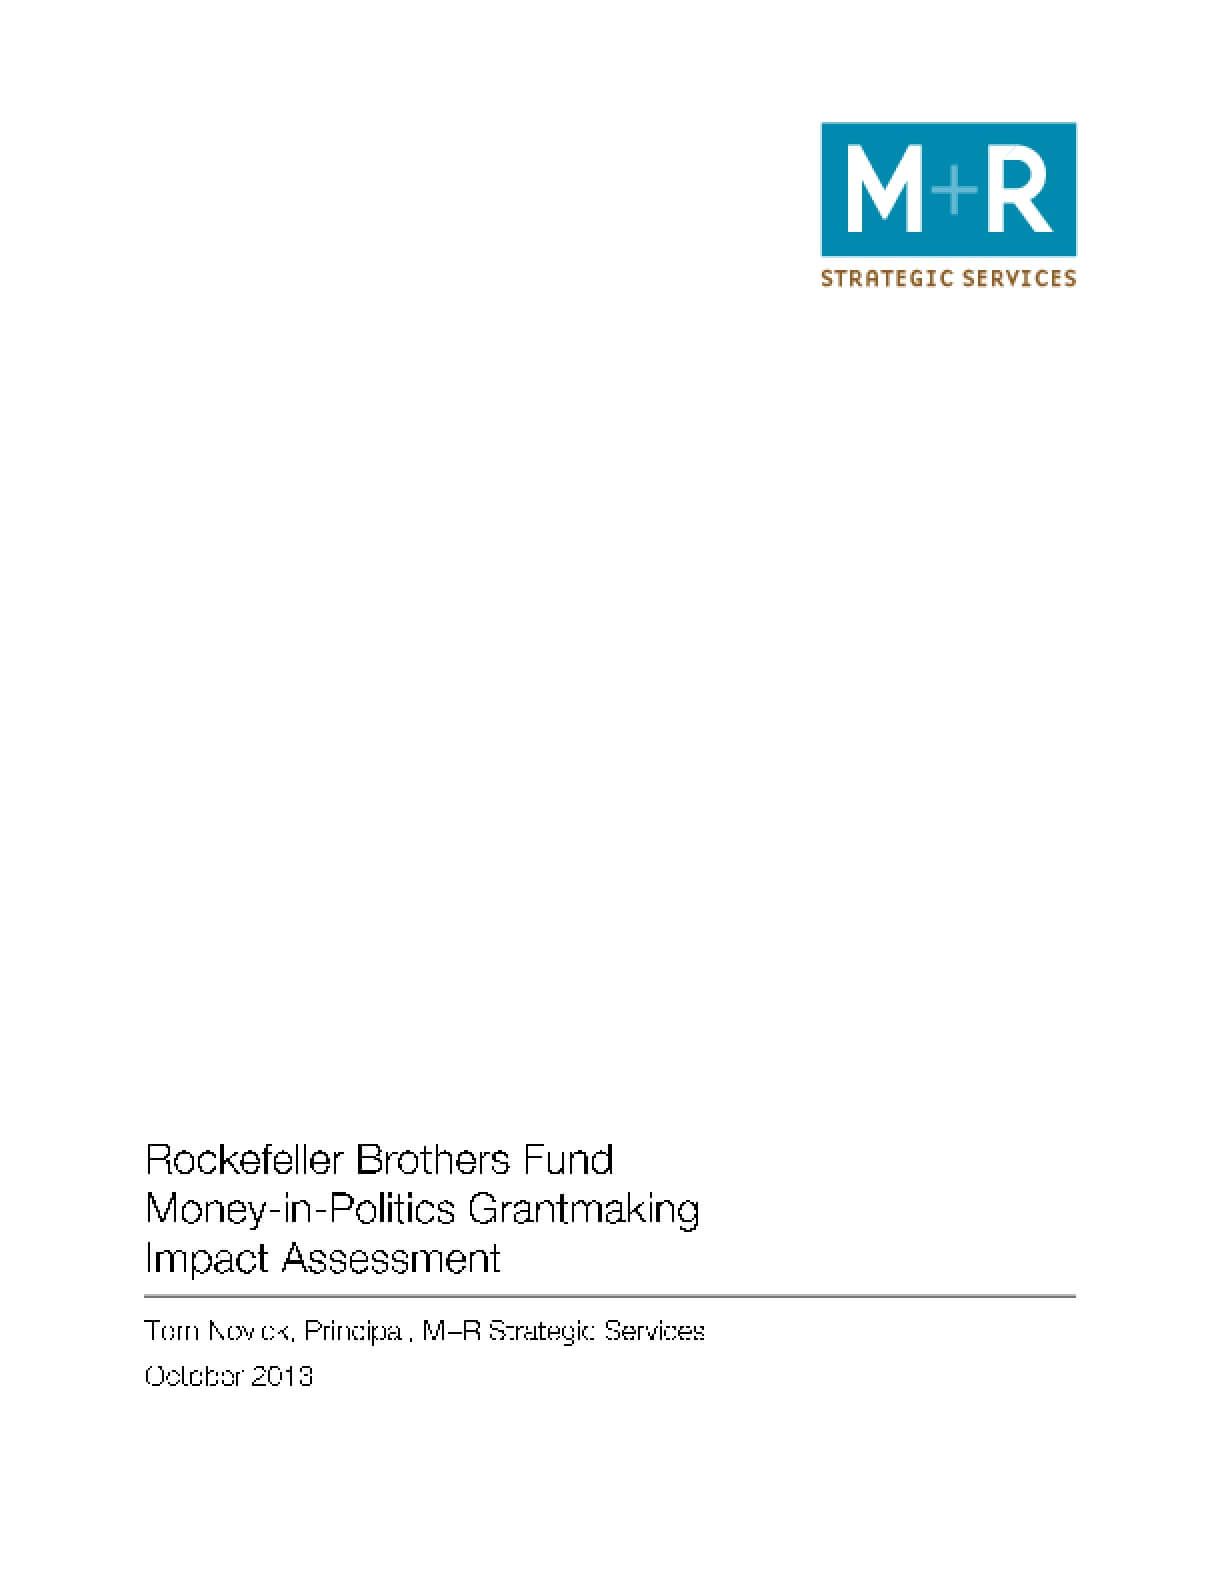 Rockefeller Brothers Fund Money-in-Politics Grantmaking Impact Assessment